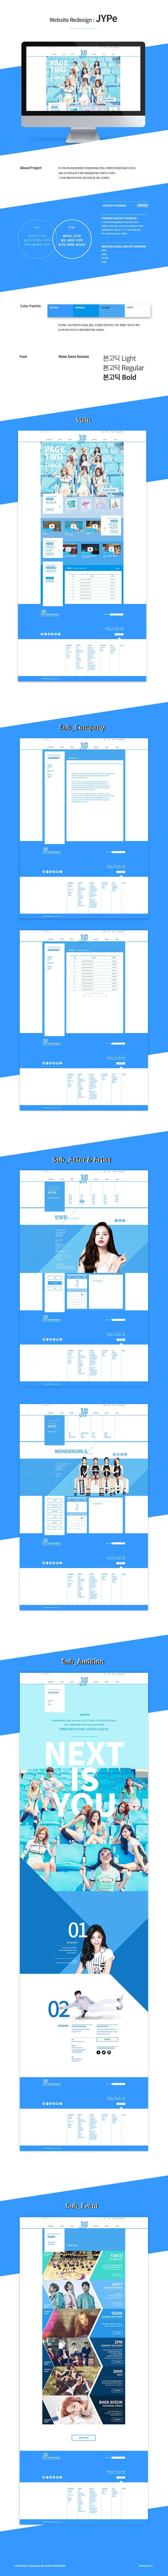 Web Redesign _ JYP Entertainment - 그래픽 디자인 · 브랜딩/편집, 그래픽 디자인, 브랜딩/편집, 그래픽 디자인, 브랜딩/편집